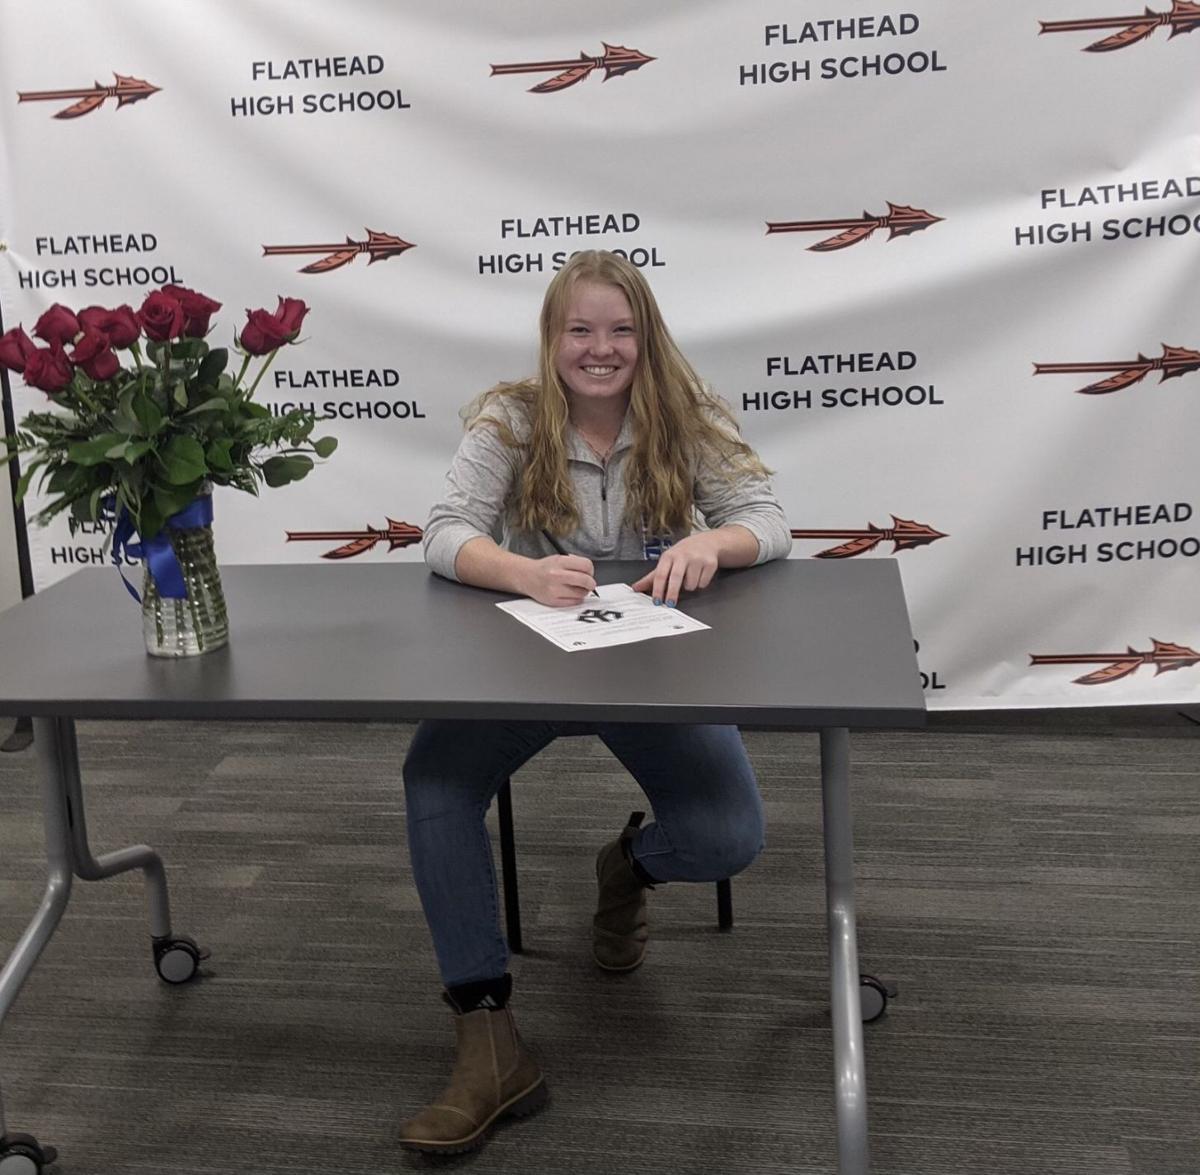 Flathead Marcella Mercer signs college